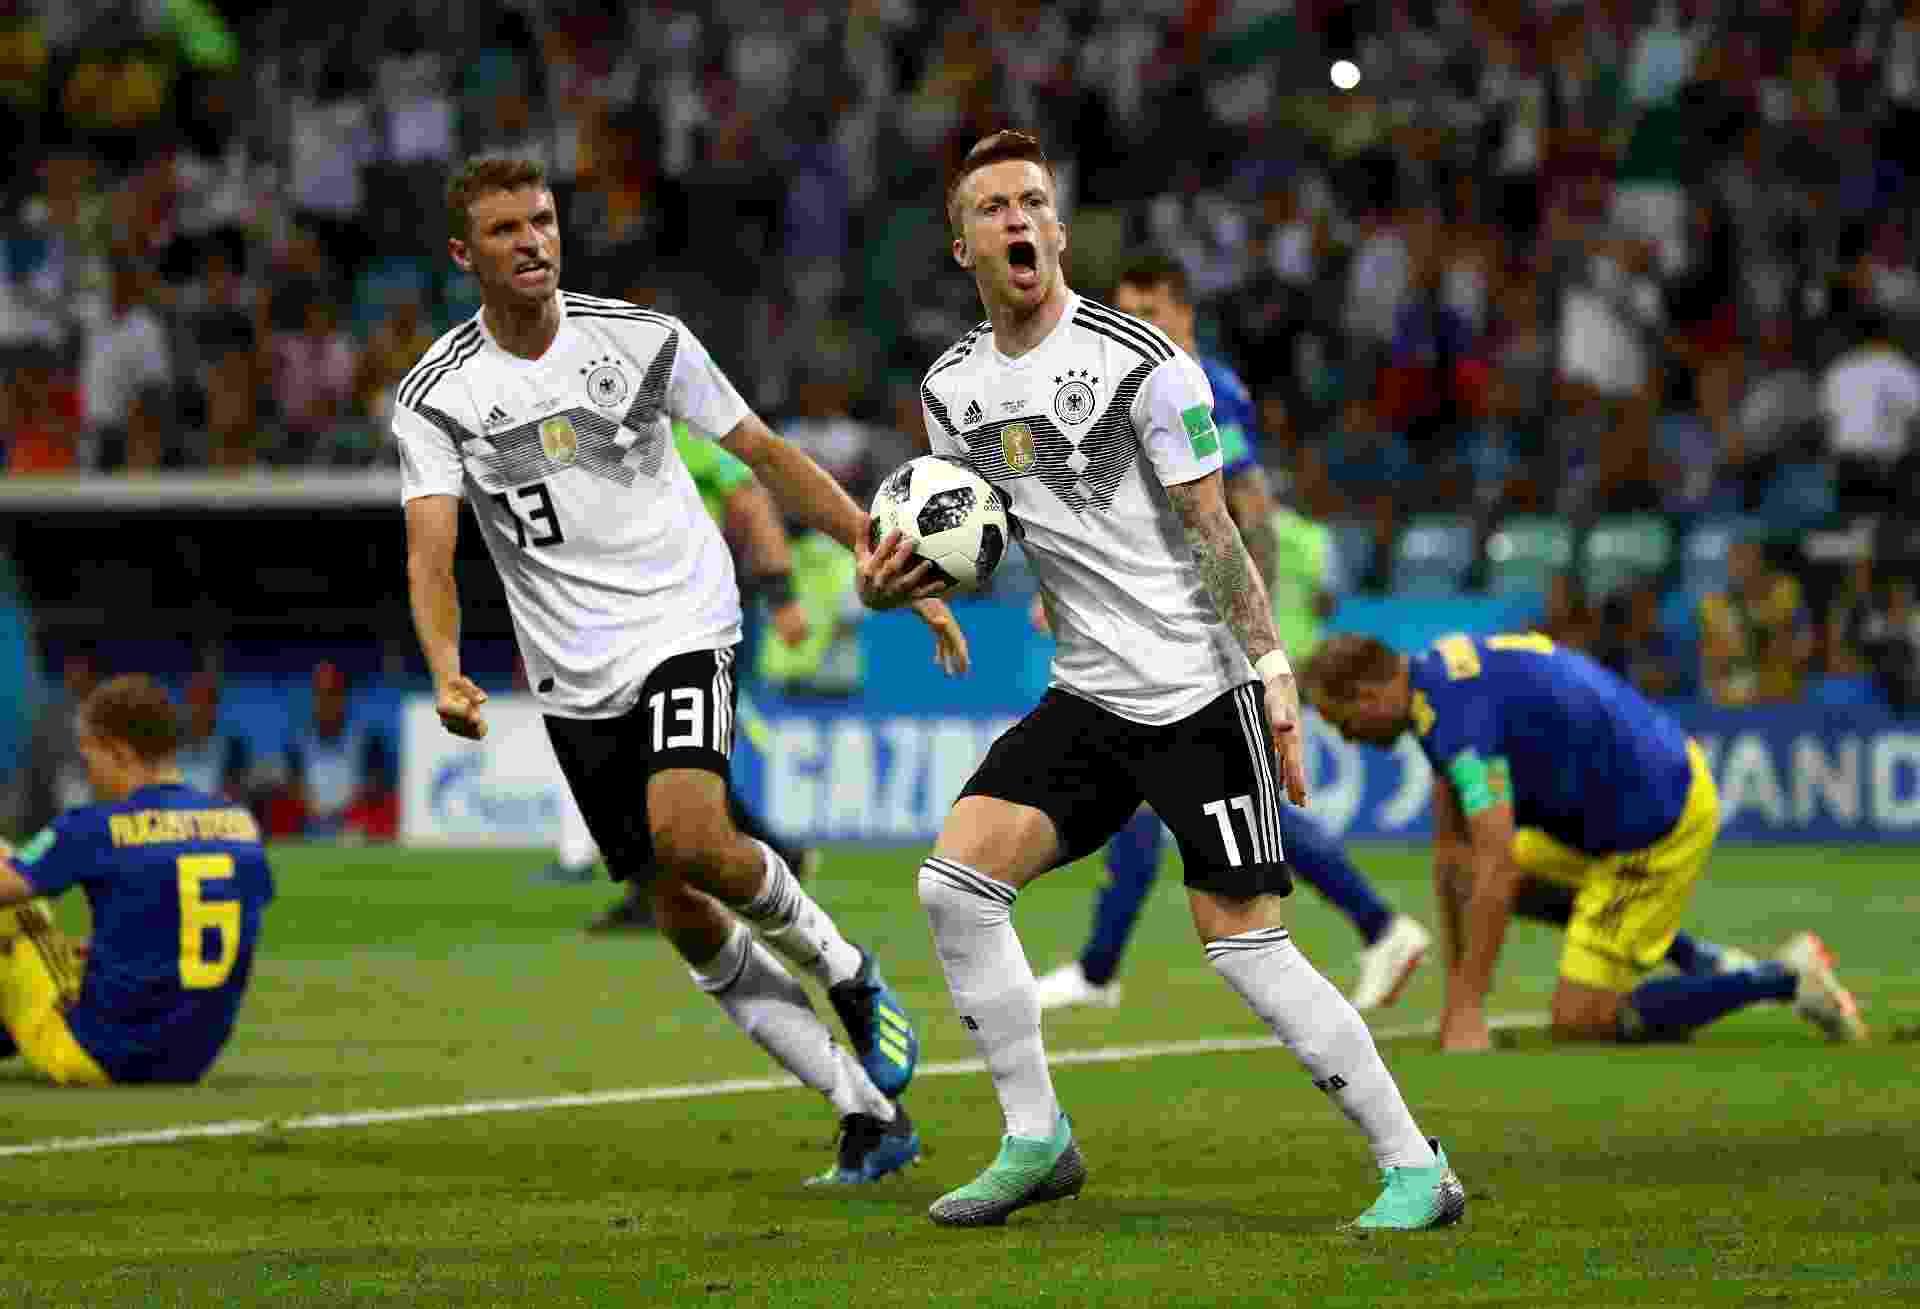 Marco Reus comemora gol da Alemanha contra a Suécia - Dean Mouhtaropoulos/Getty Images